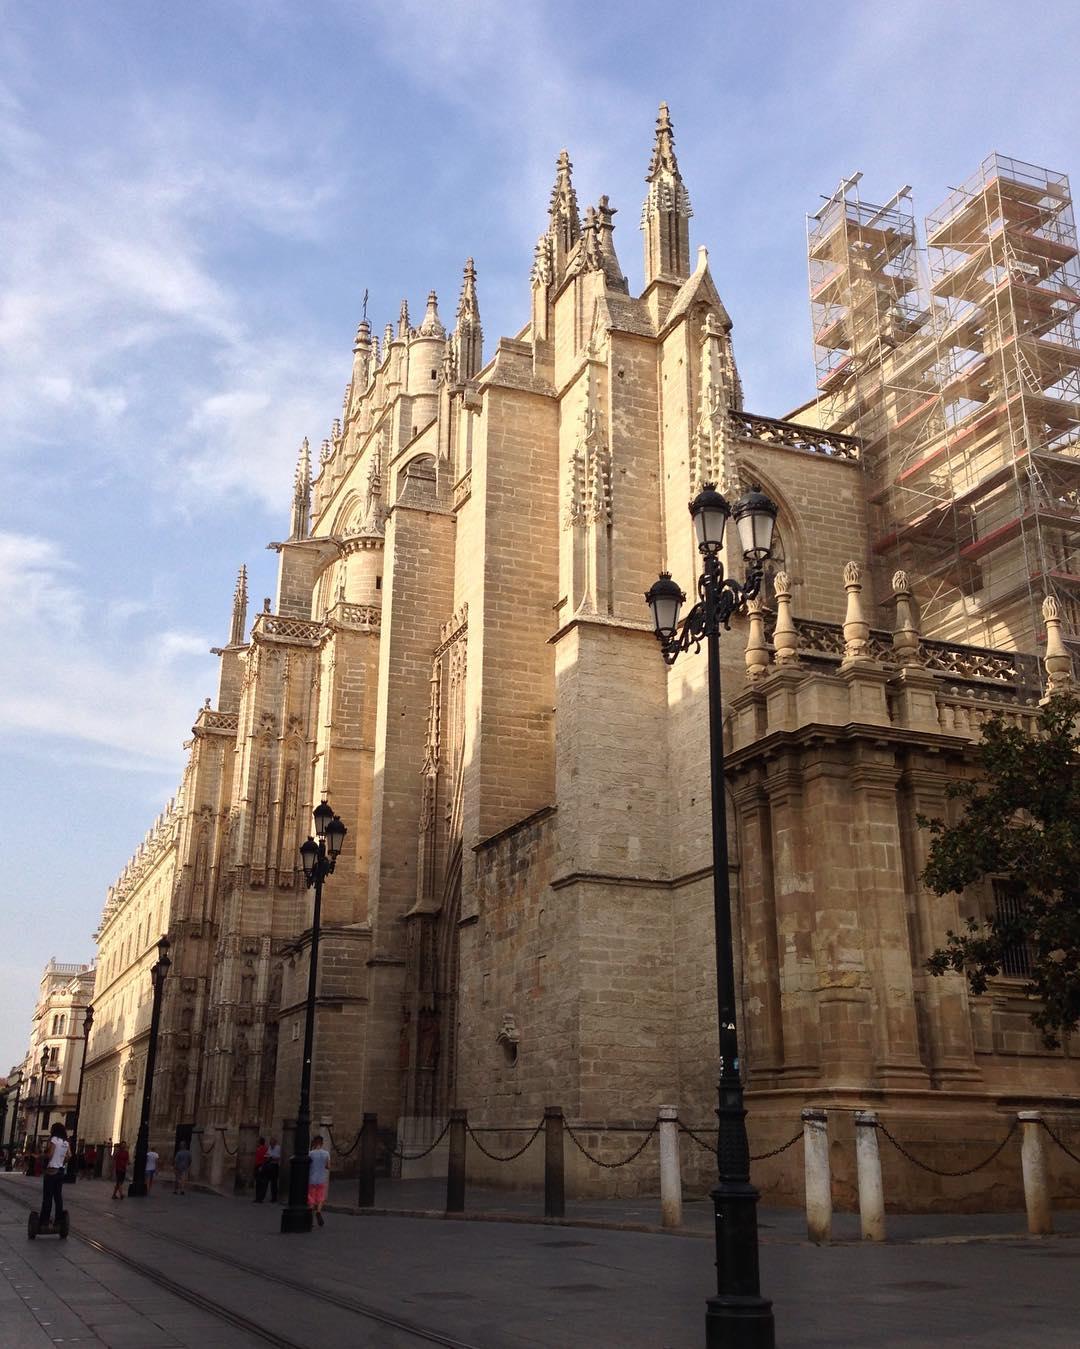 Catedral de Sevilla - Catedral De Sevilla